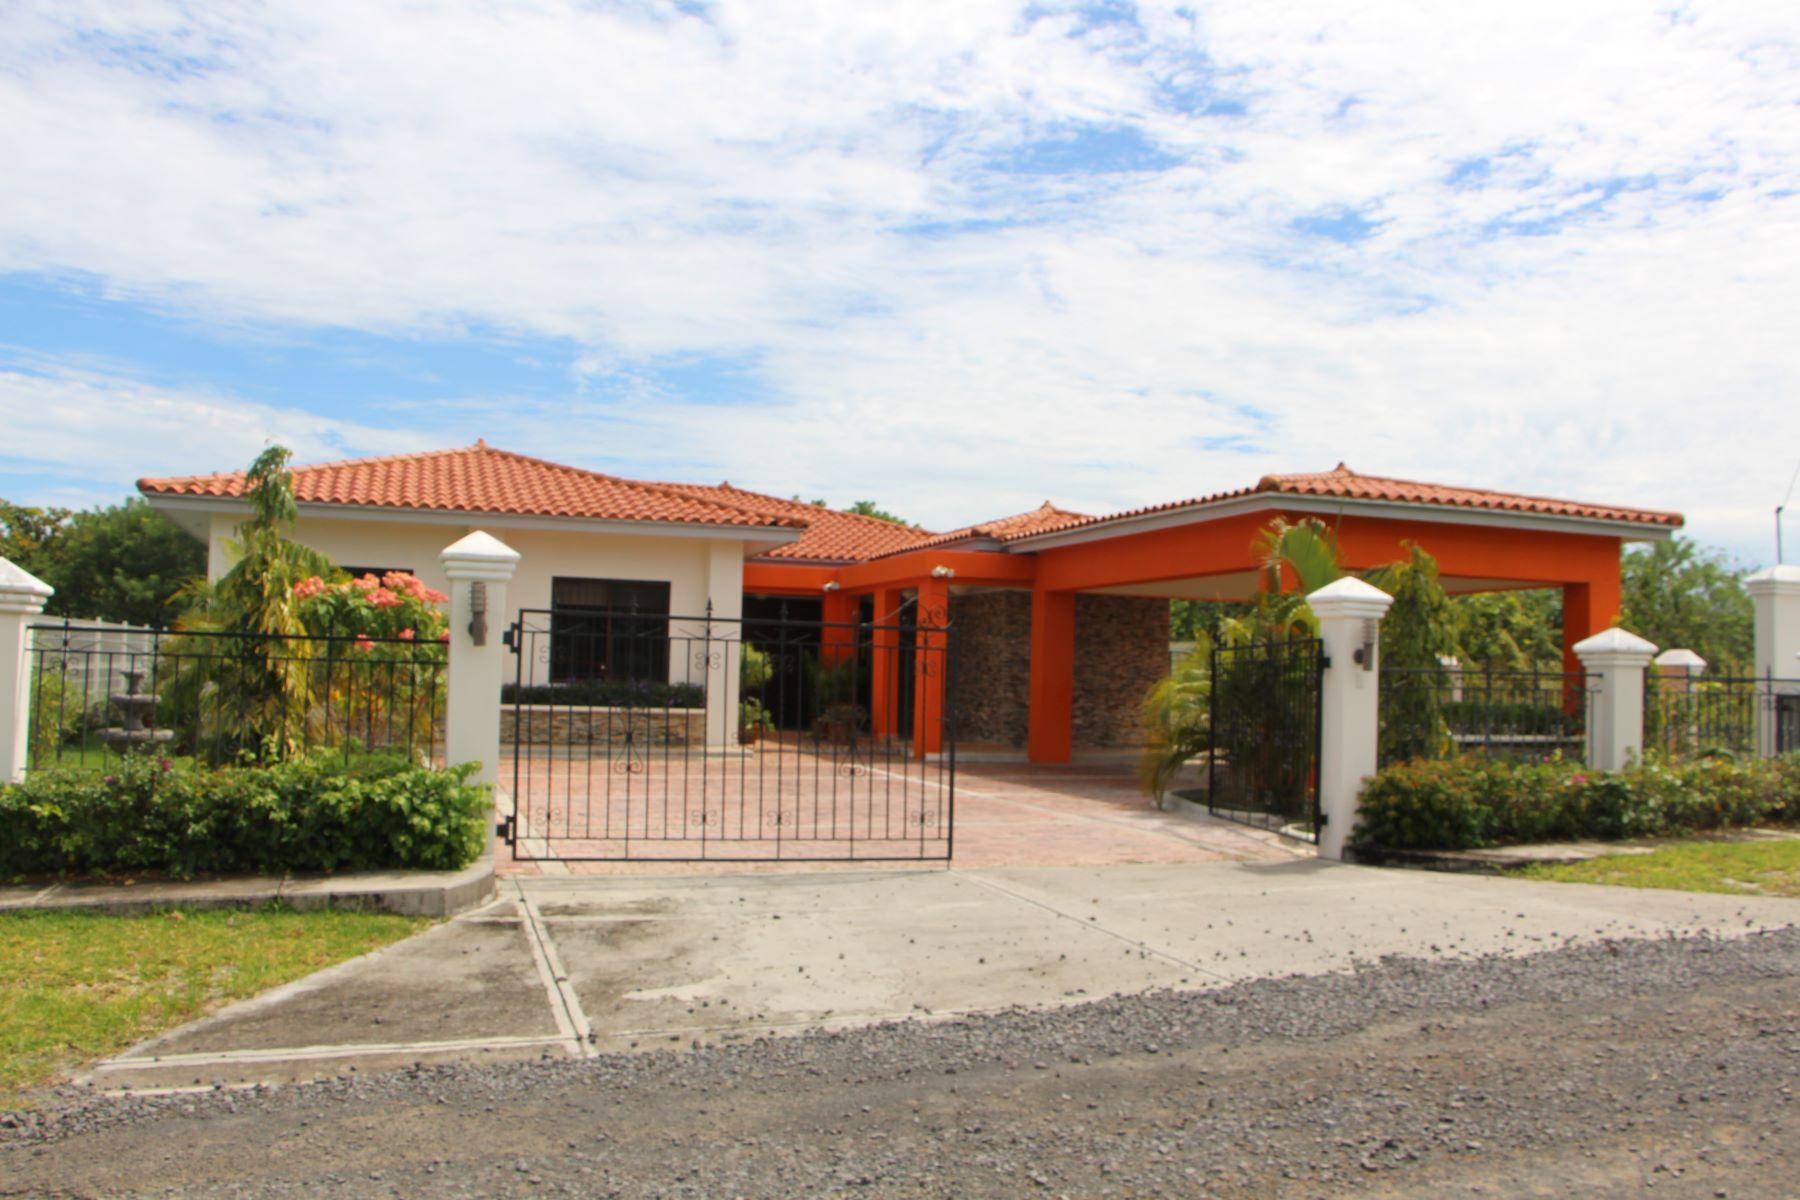 Single Family Home for Sale at Palmeras del Golf Nuevo Gorgona Palmeras del Golf, Other Panama, Panama, 55555 Panama